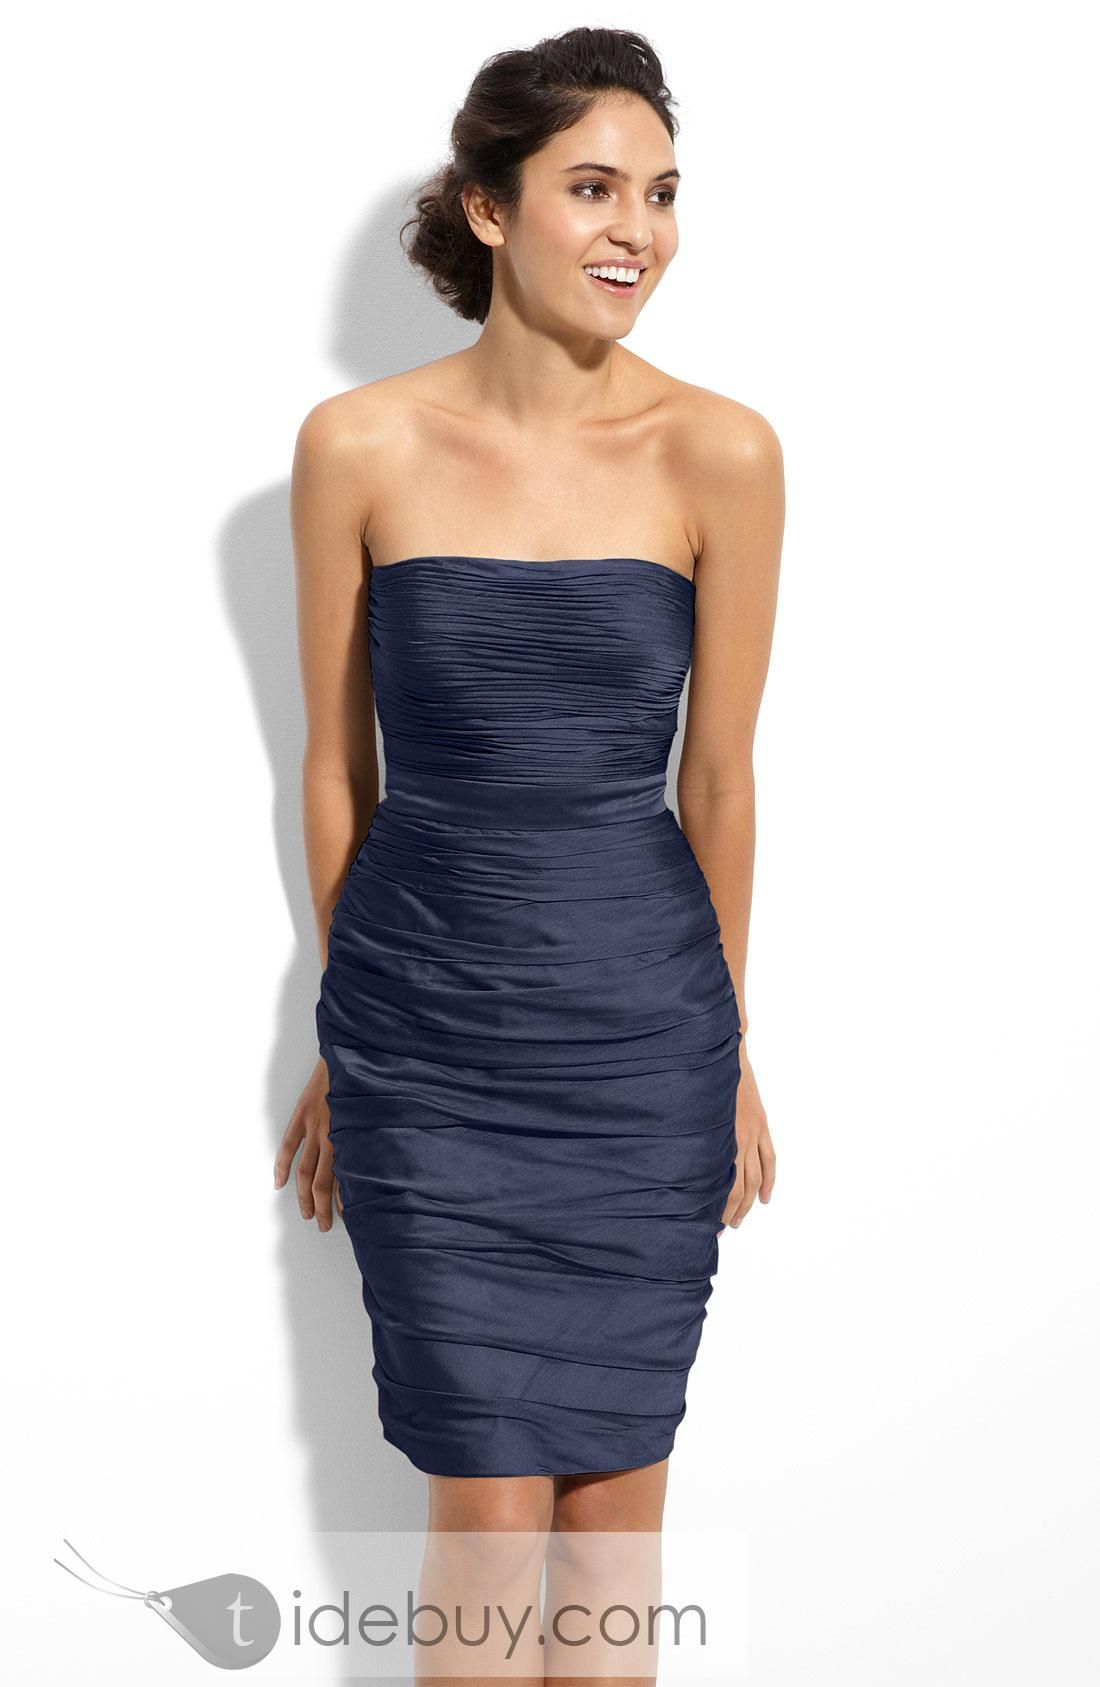 Unique sheathcolumn shortminilength strapless bridesmaid dress